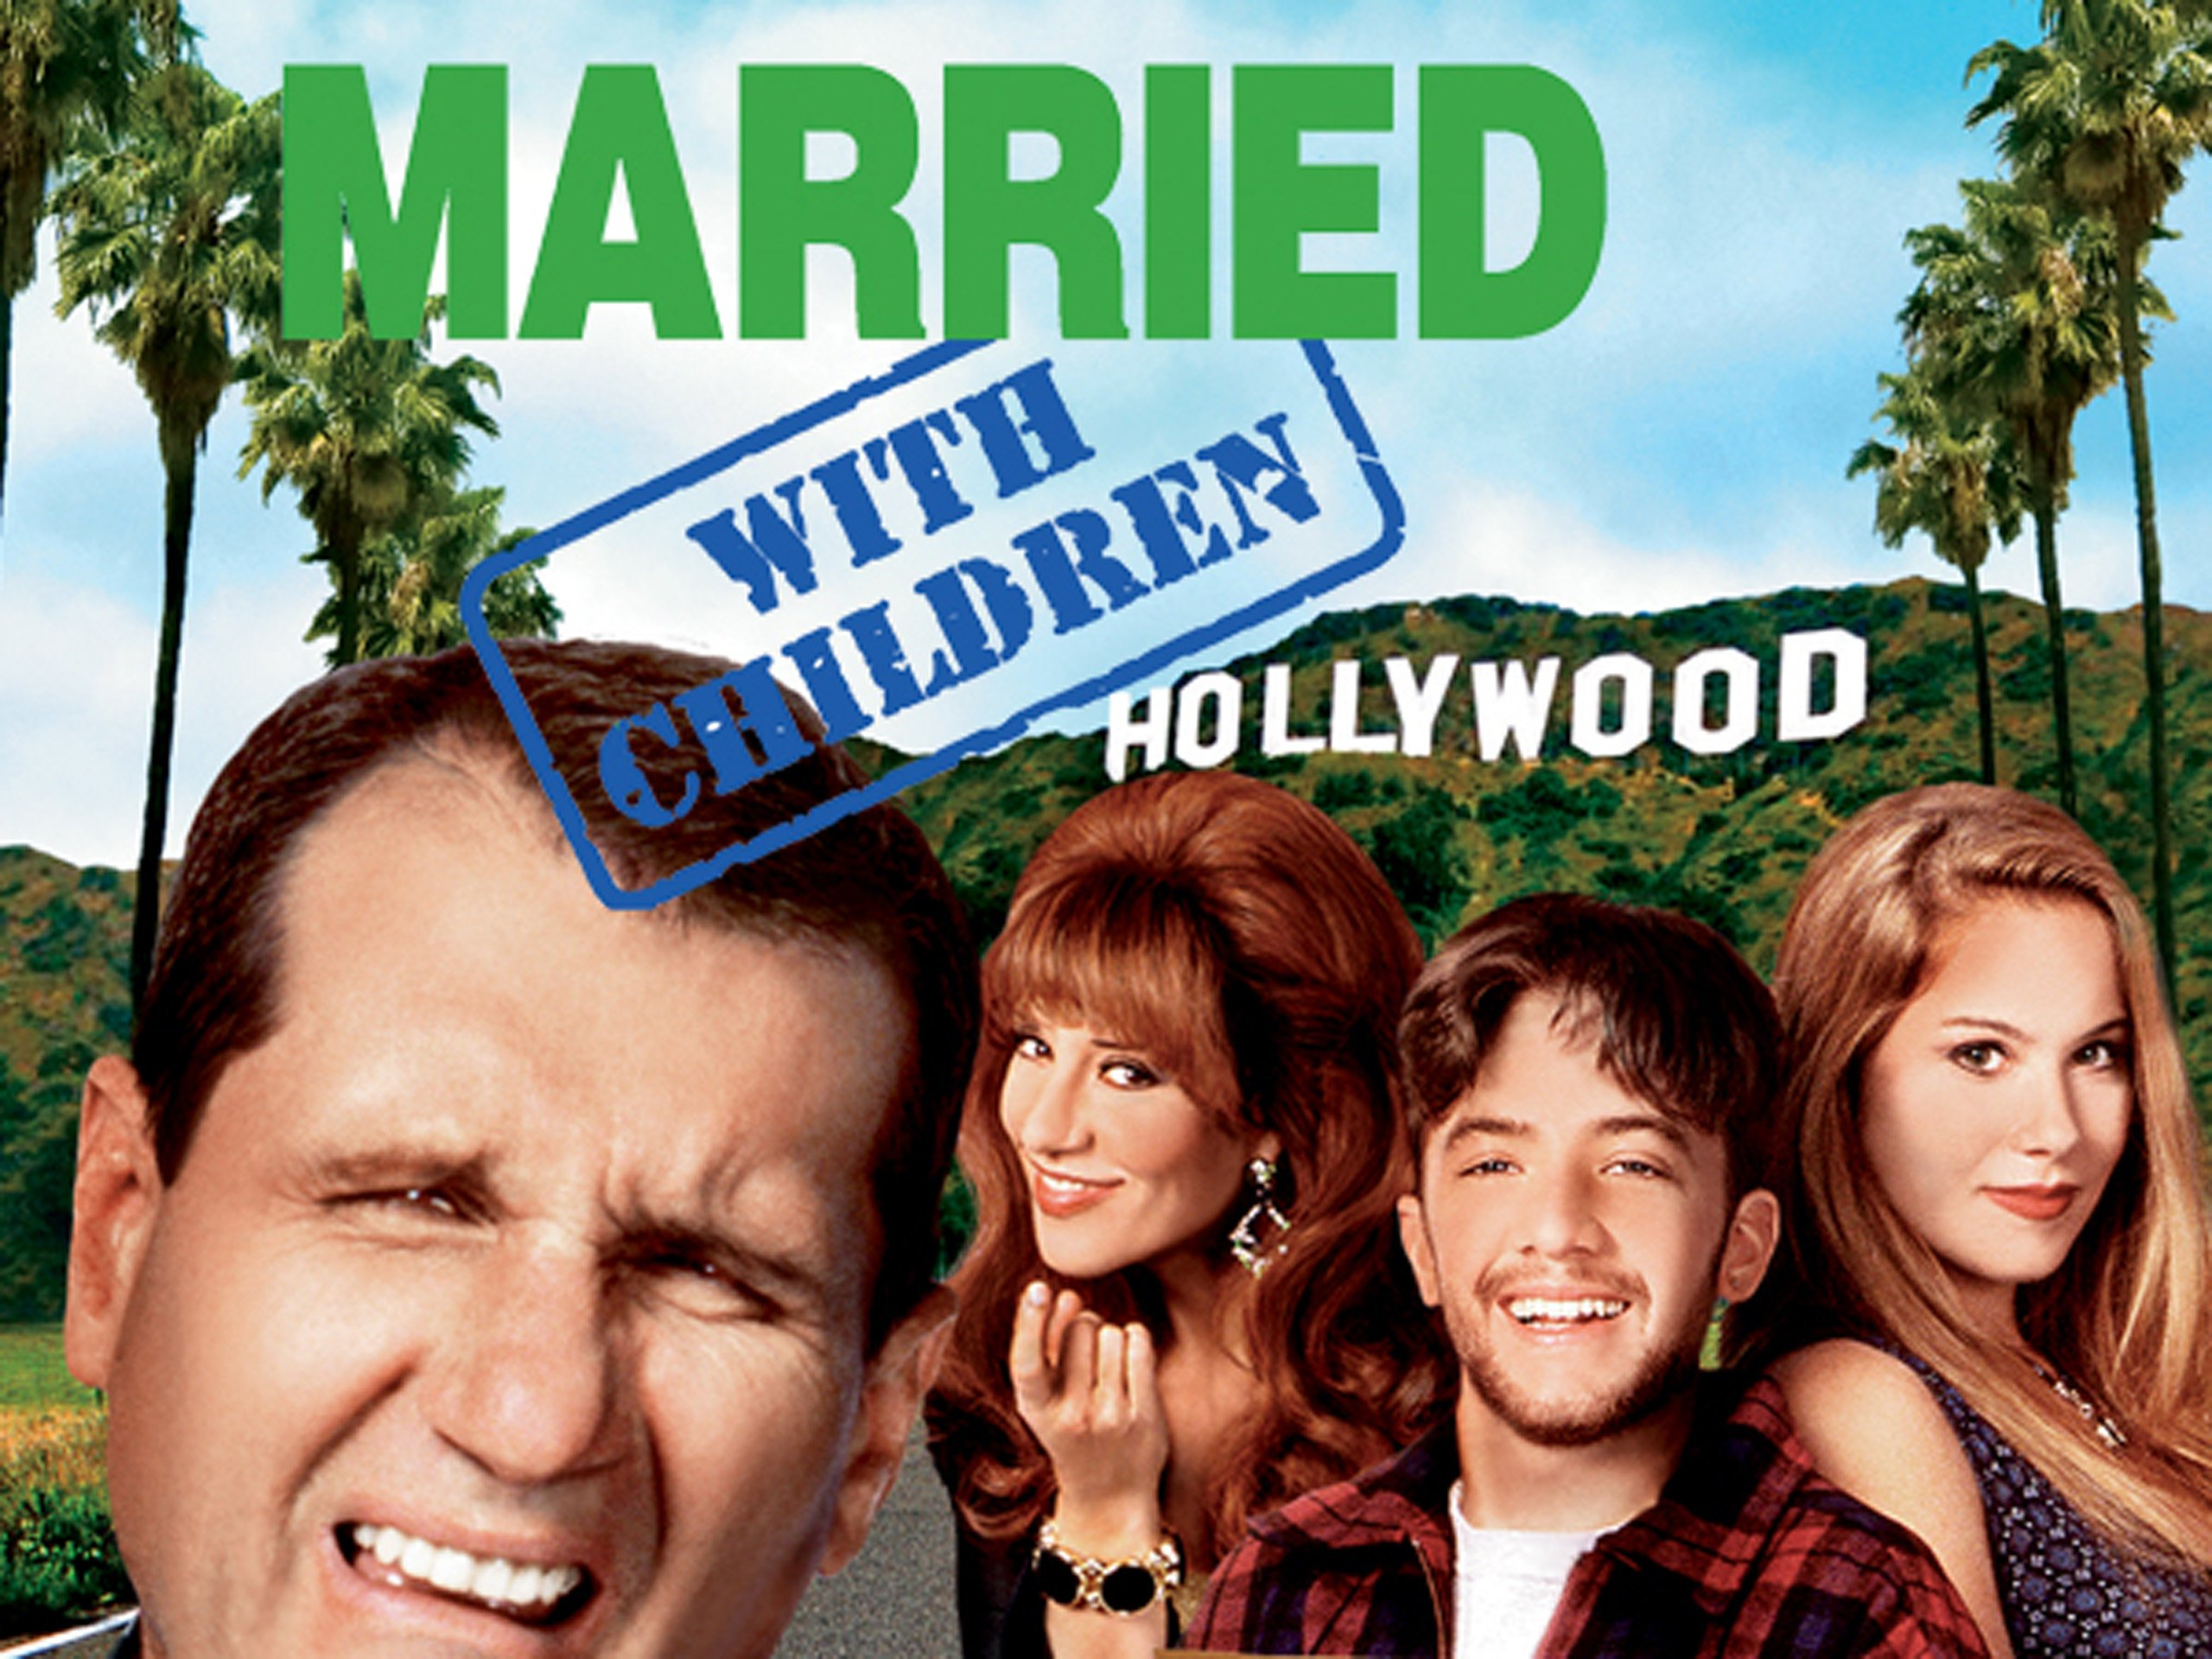 Watch Married With Children - Season 11 Episode 17: Live